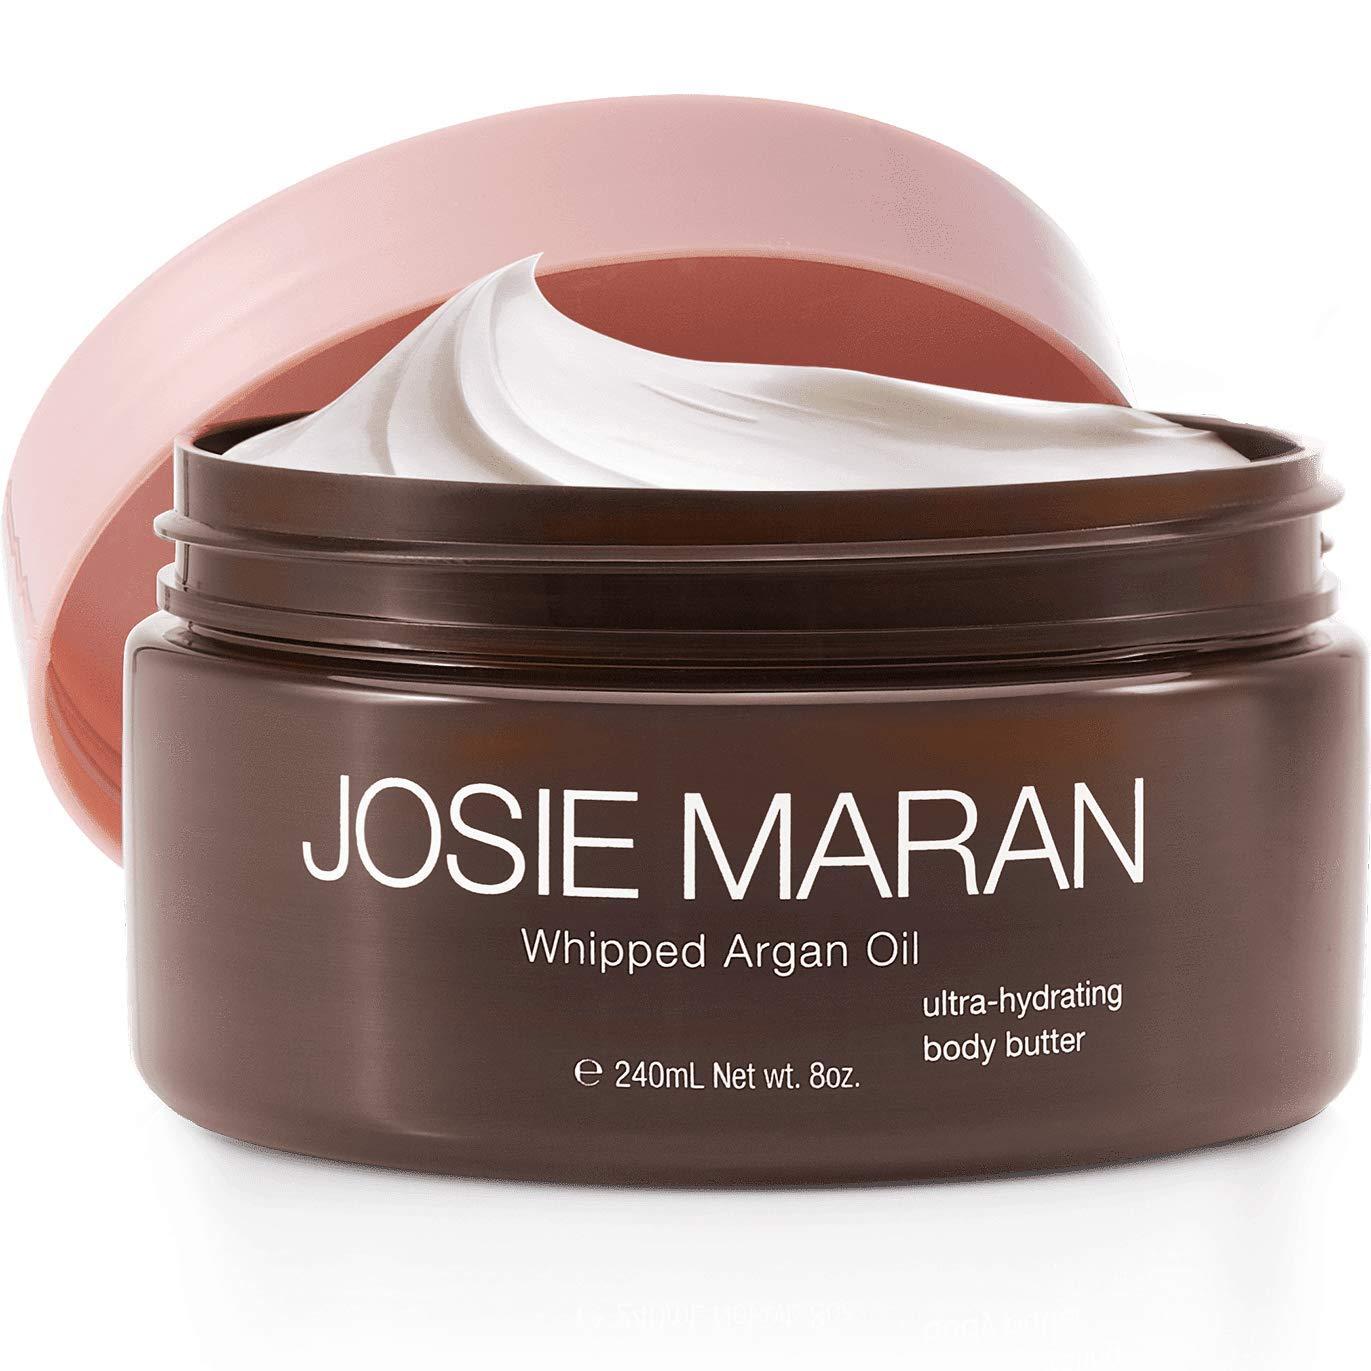 Josie Maran Whipped Argan Oil Body Butter - Immediate, Lightweight, and Long-Lasting Nourishment to Soften and Hydrate Skin (240ml/8.0oz, Vanilla Bean) by Josie Maran (Image #1)